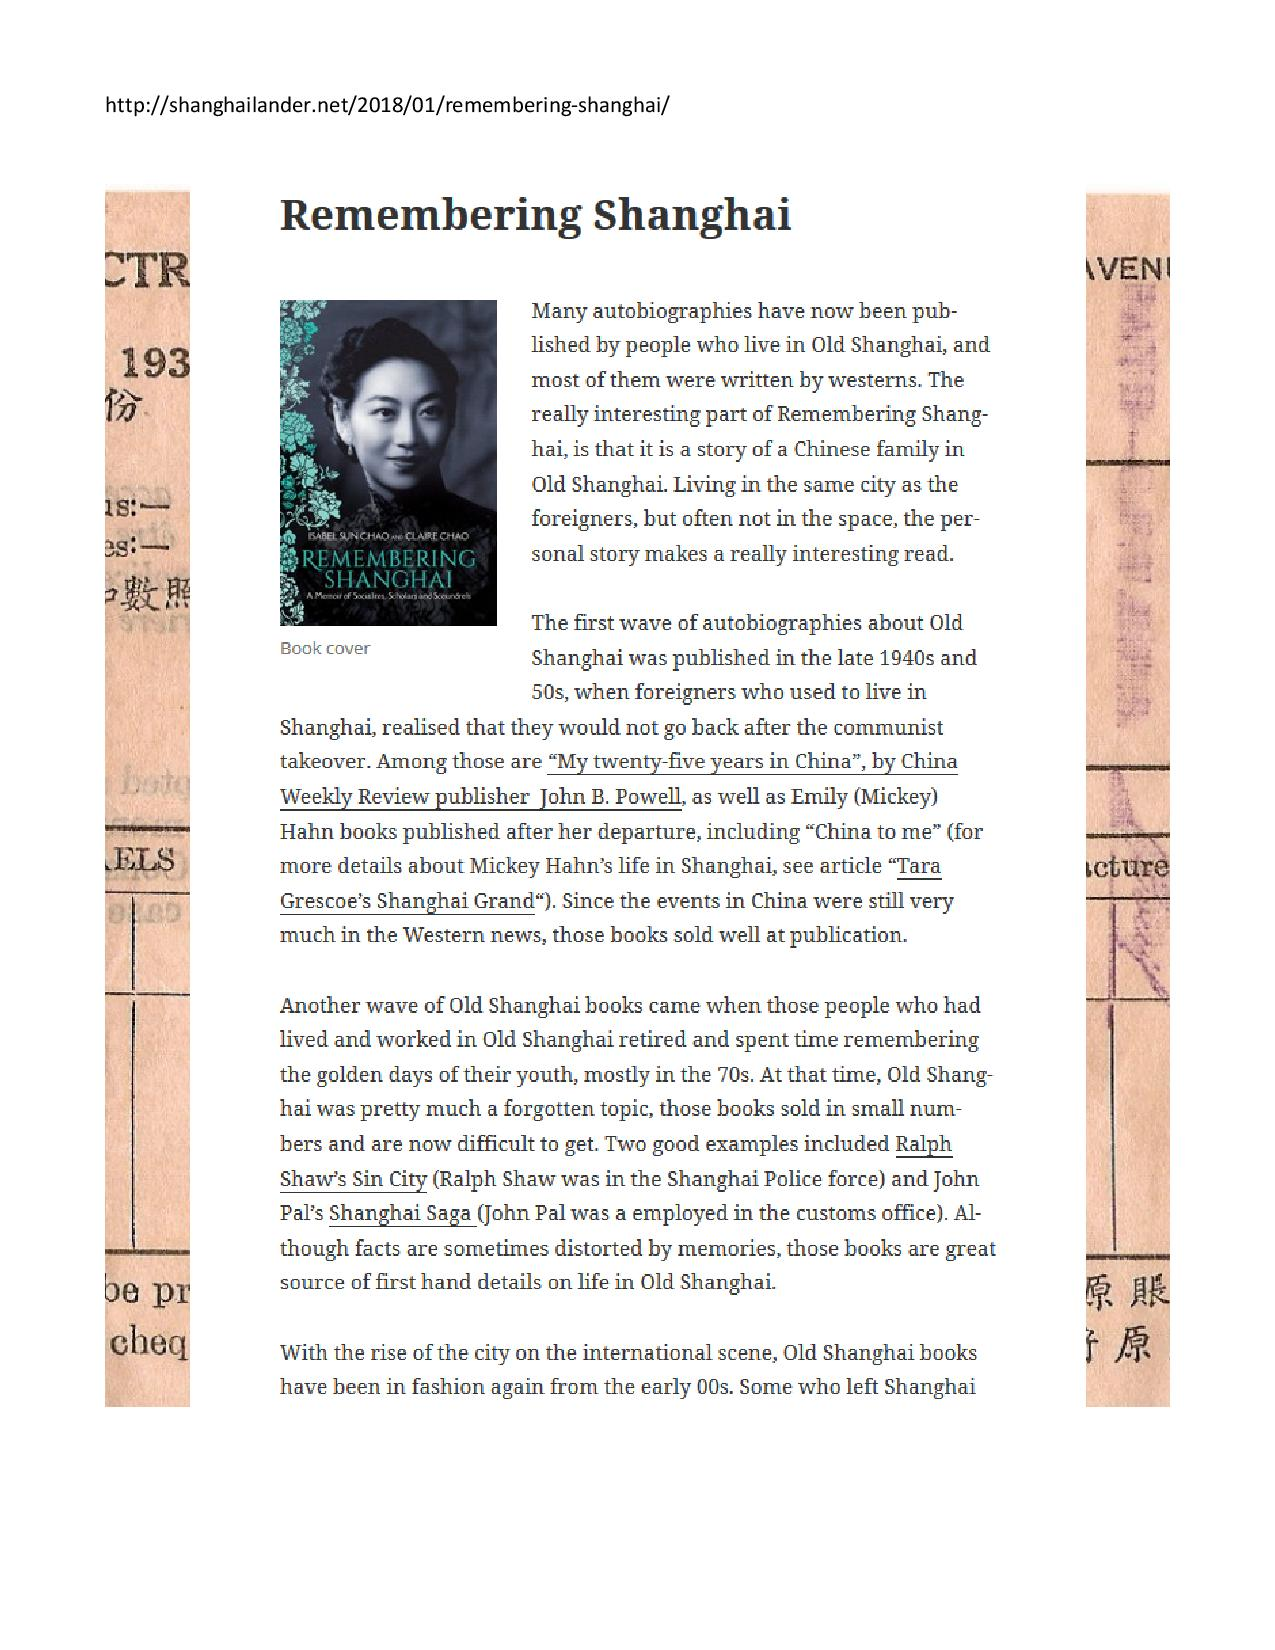 shanghailander.net, January 2018